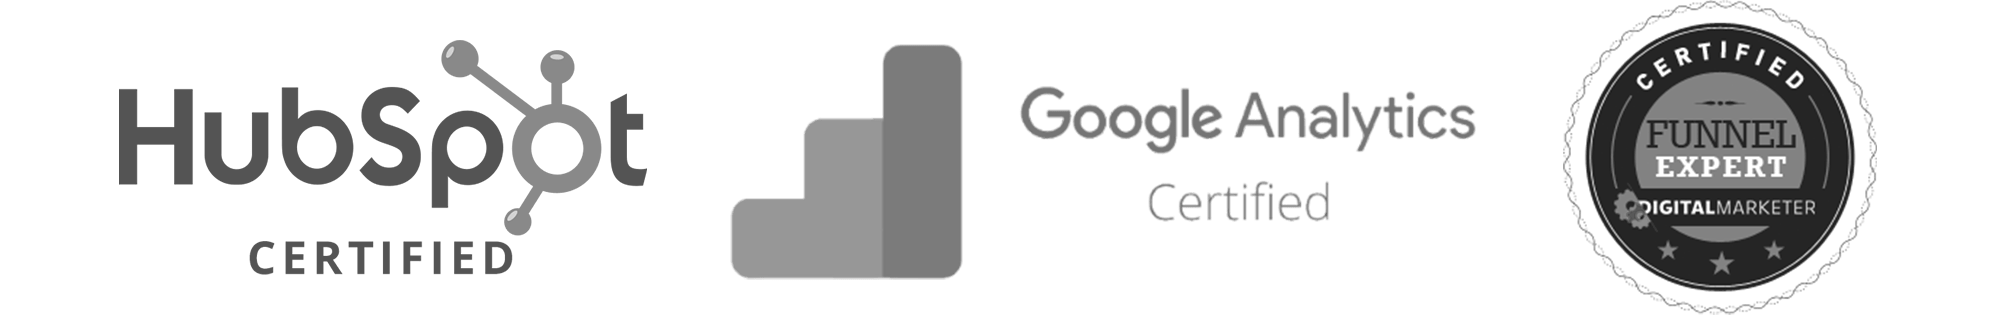 HubSpot Certified Google Analytics Certified DigitalMarketer Funnel